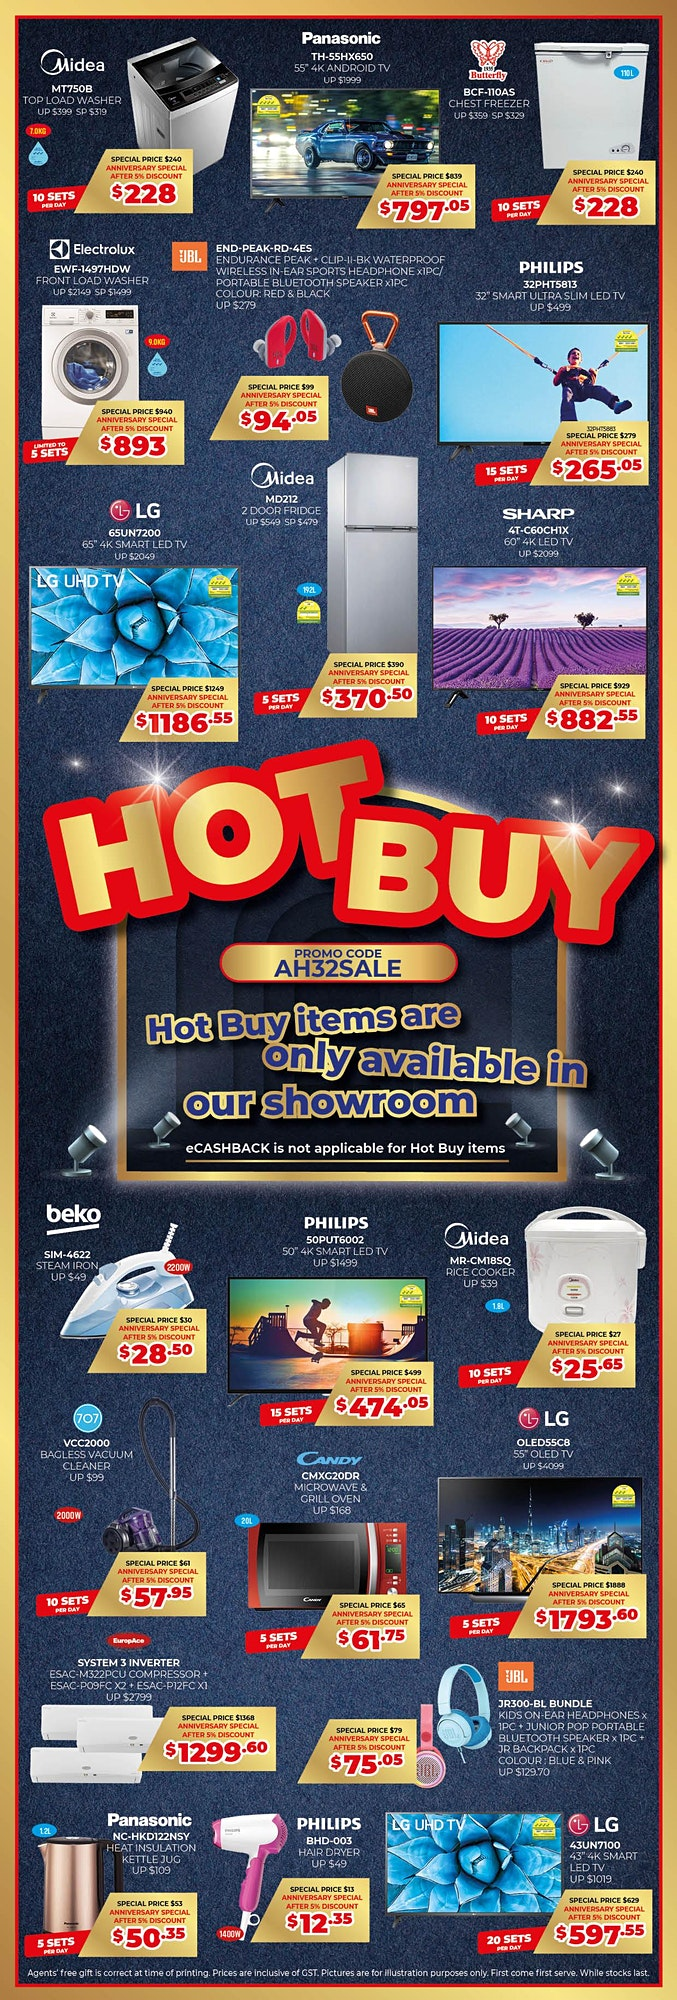 Audio House 32nd Anniversary Sale image